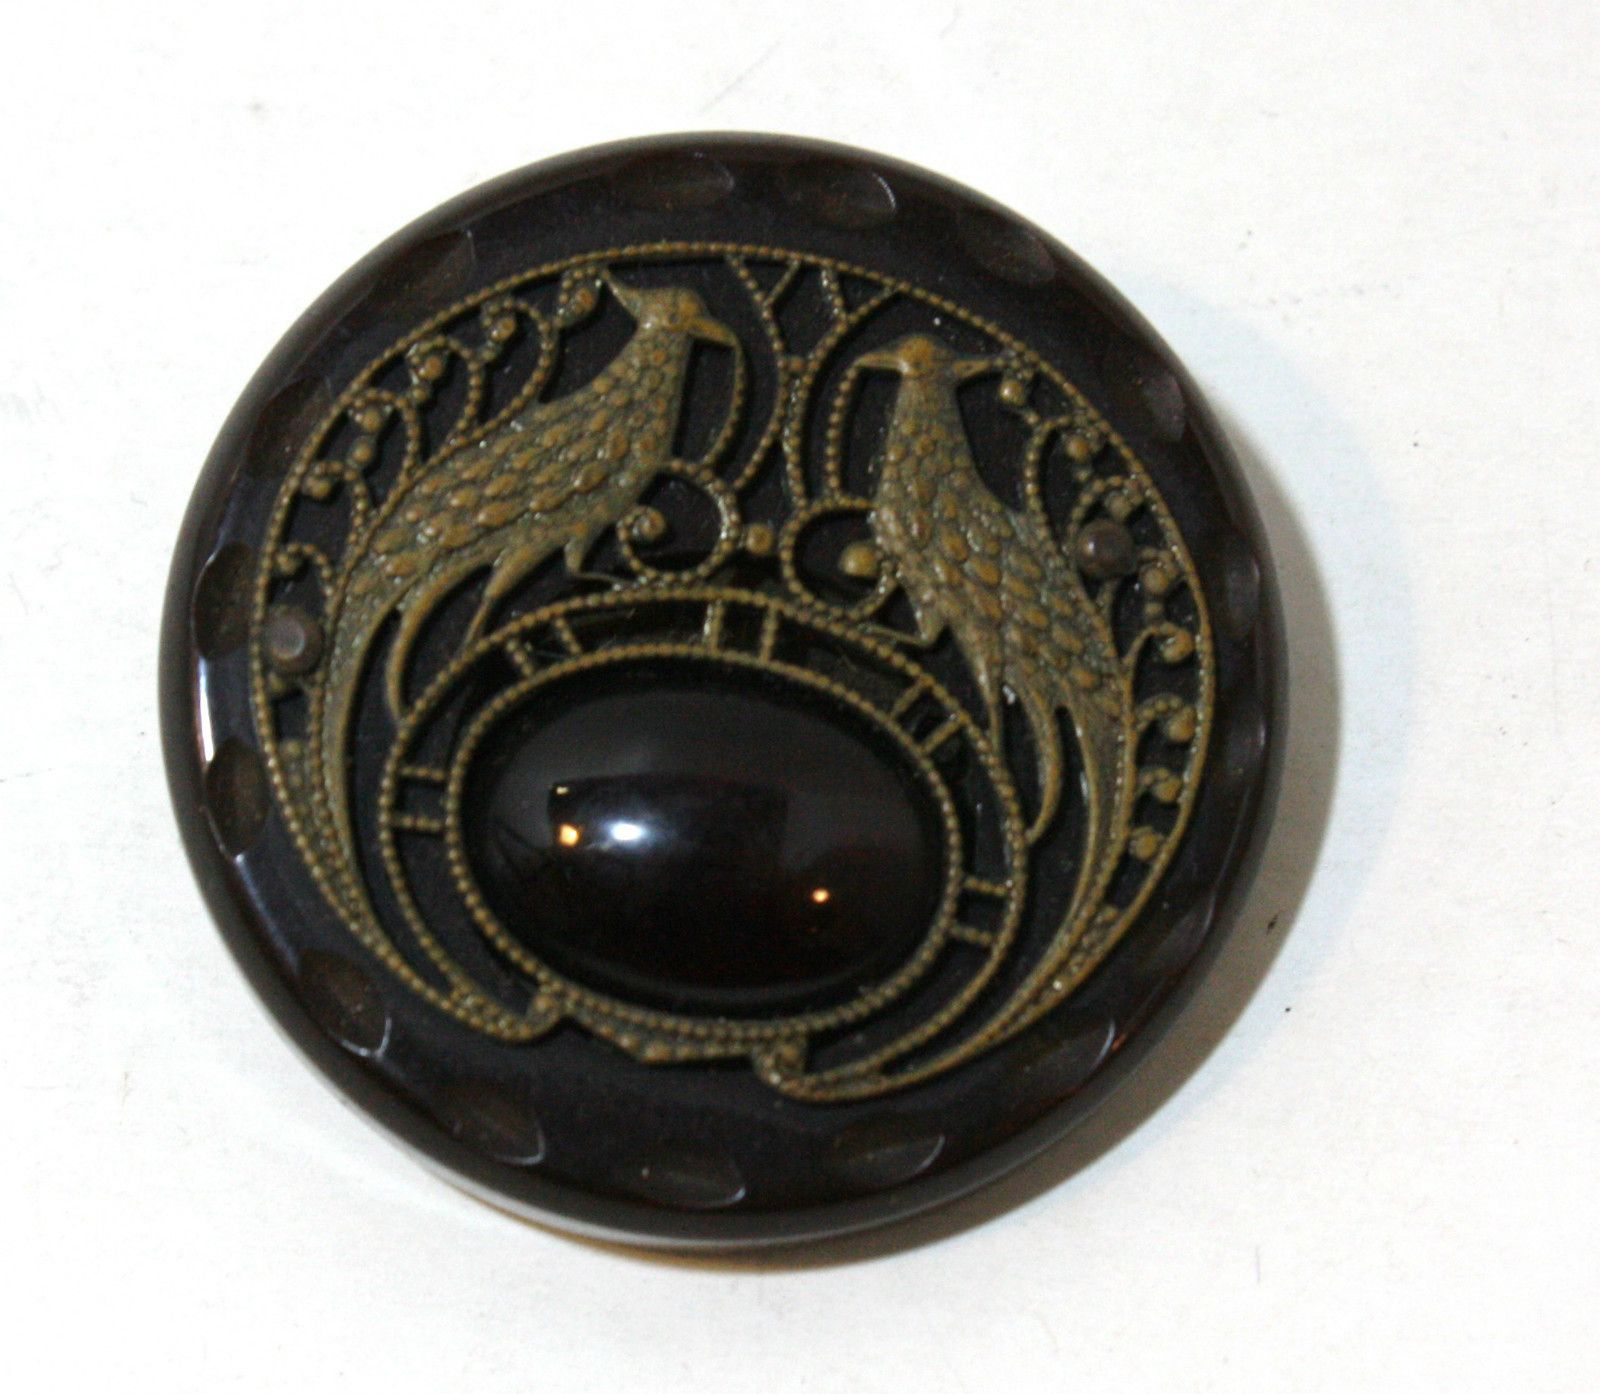 1920s Brass Filigree Art Nouveau Large Bakelite Buttons. Set of 2. ...Sold for $65